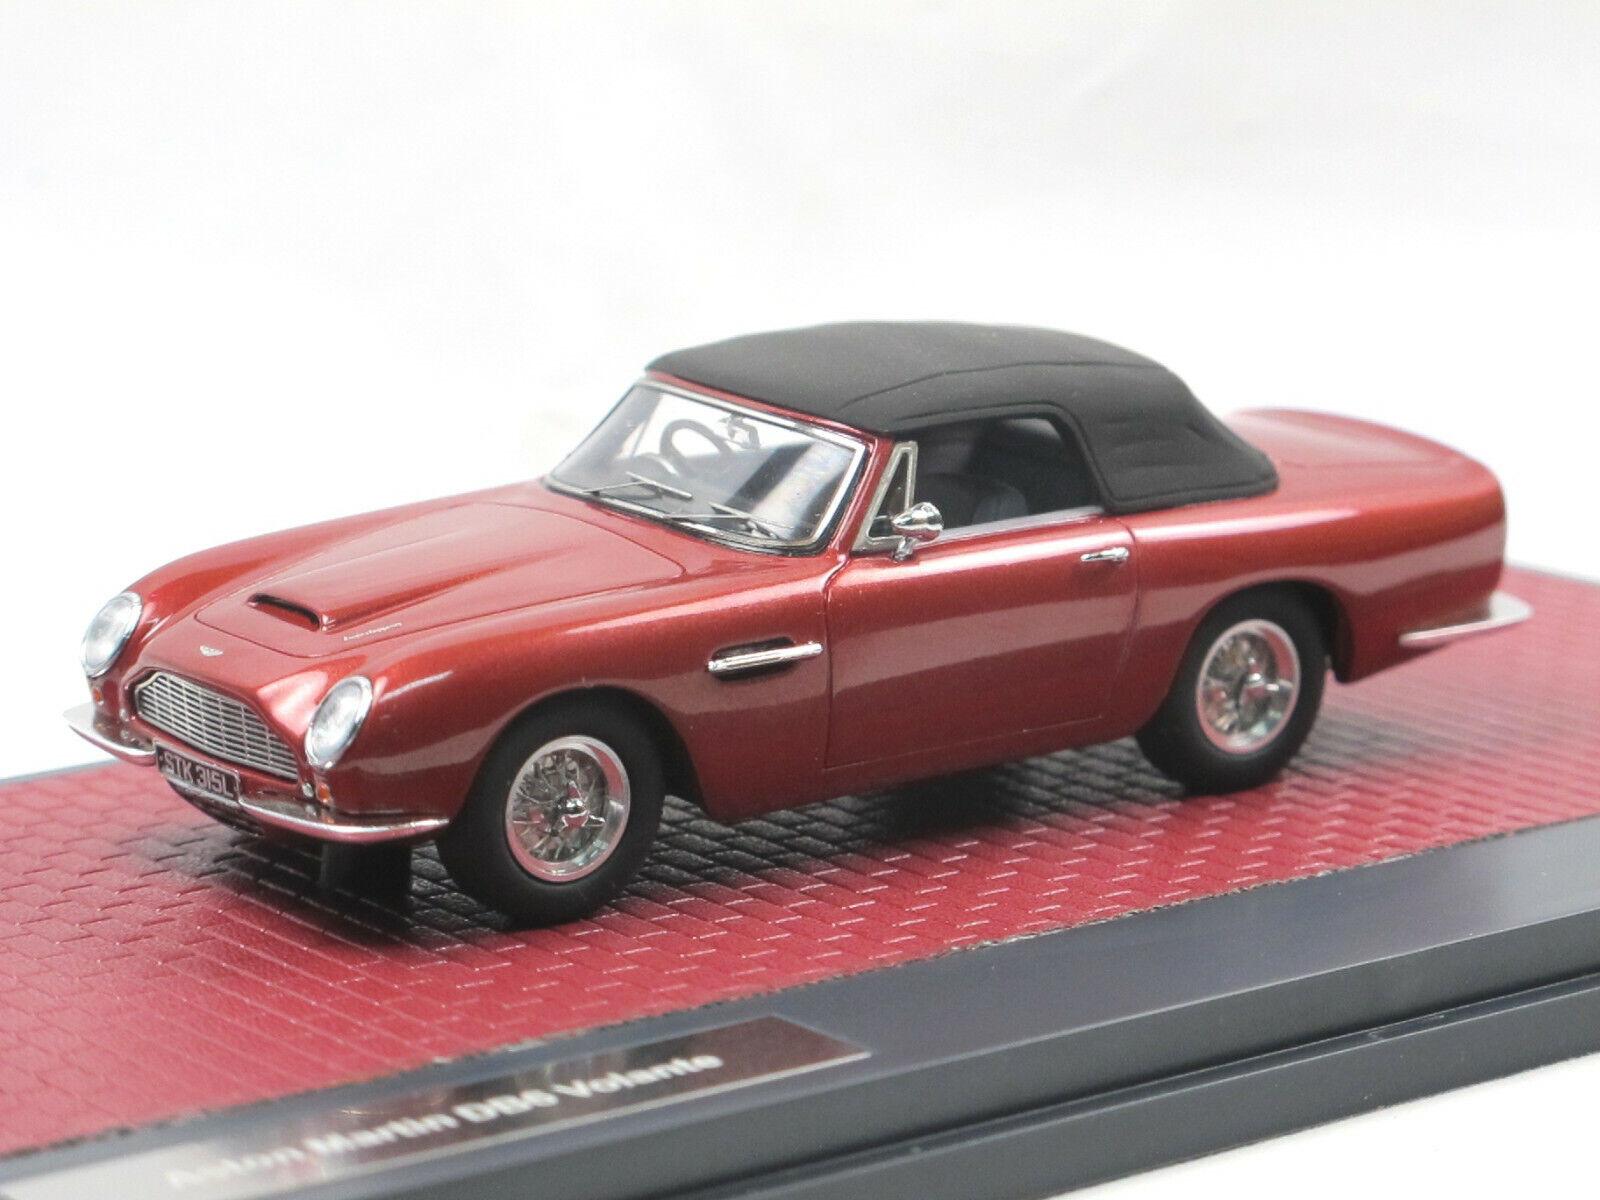 MATRIX SCALE MODELS 1968 Aston Martin db6 volante  Top Up rouge Metallic 1 43  magasins d'usine